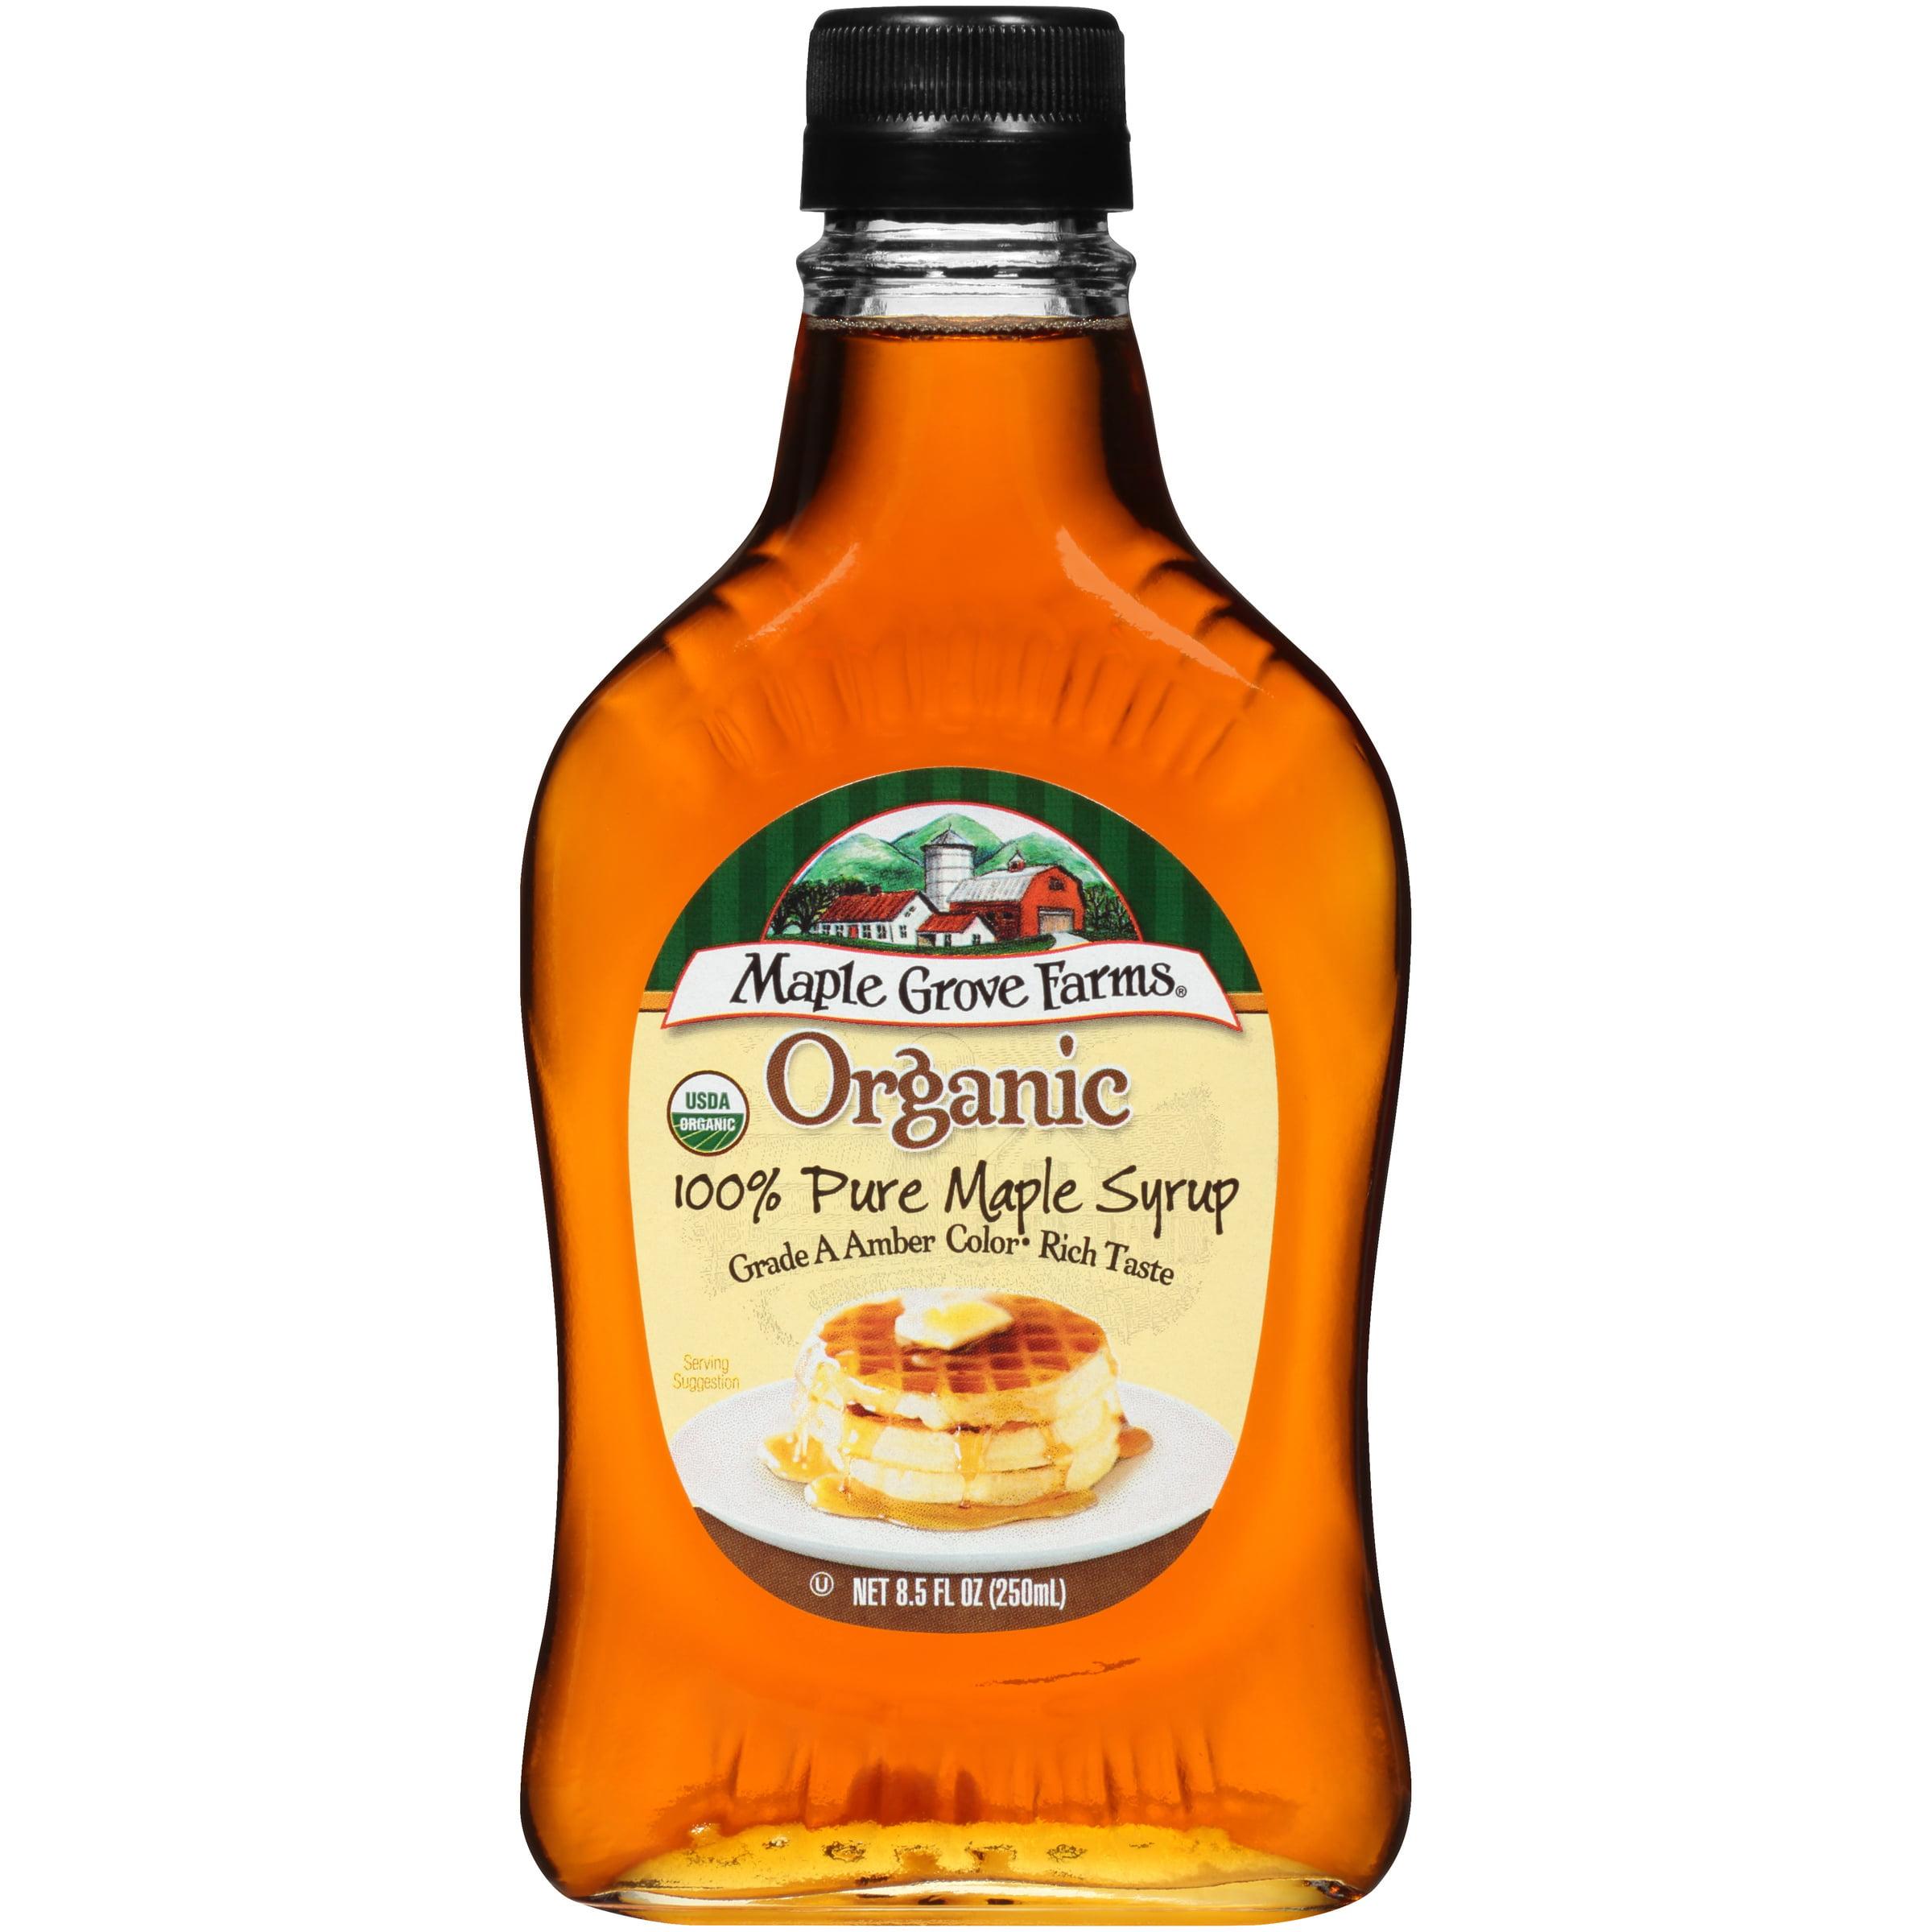 Maple Grove Farms Organic 100 Pure Maple Syrup 8 5 Fl Oz Bottle Walmart Com Walmart Com